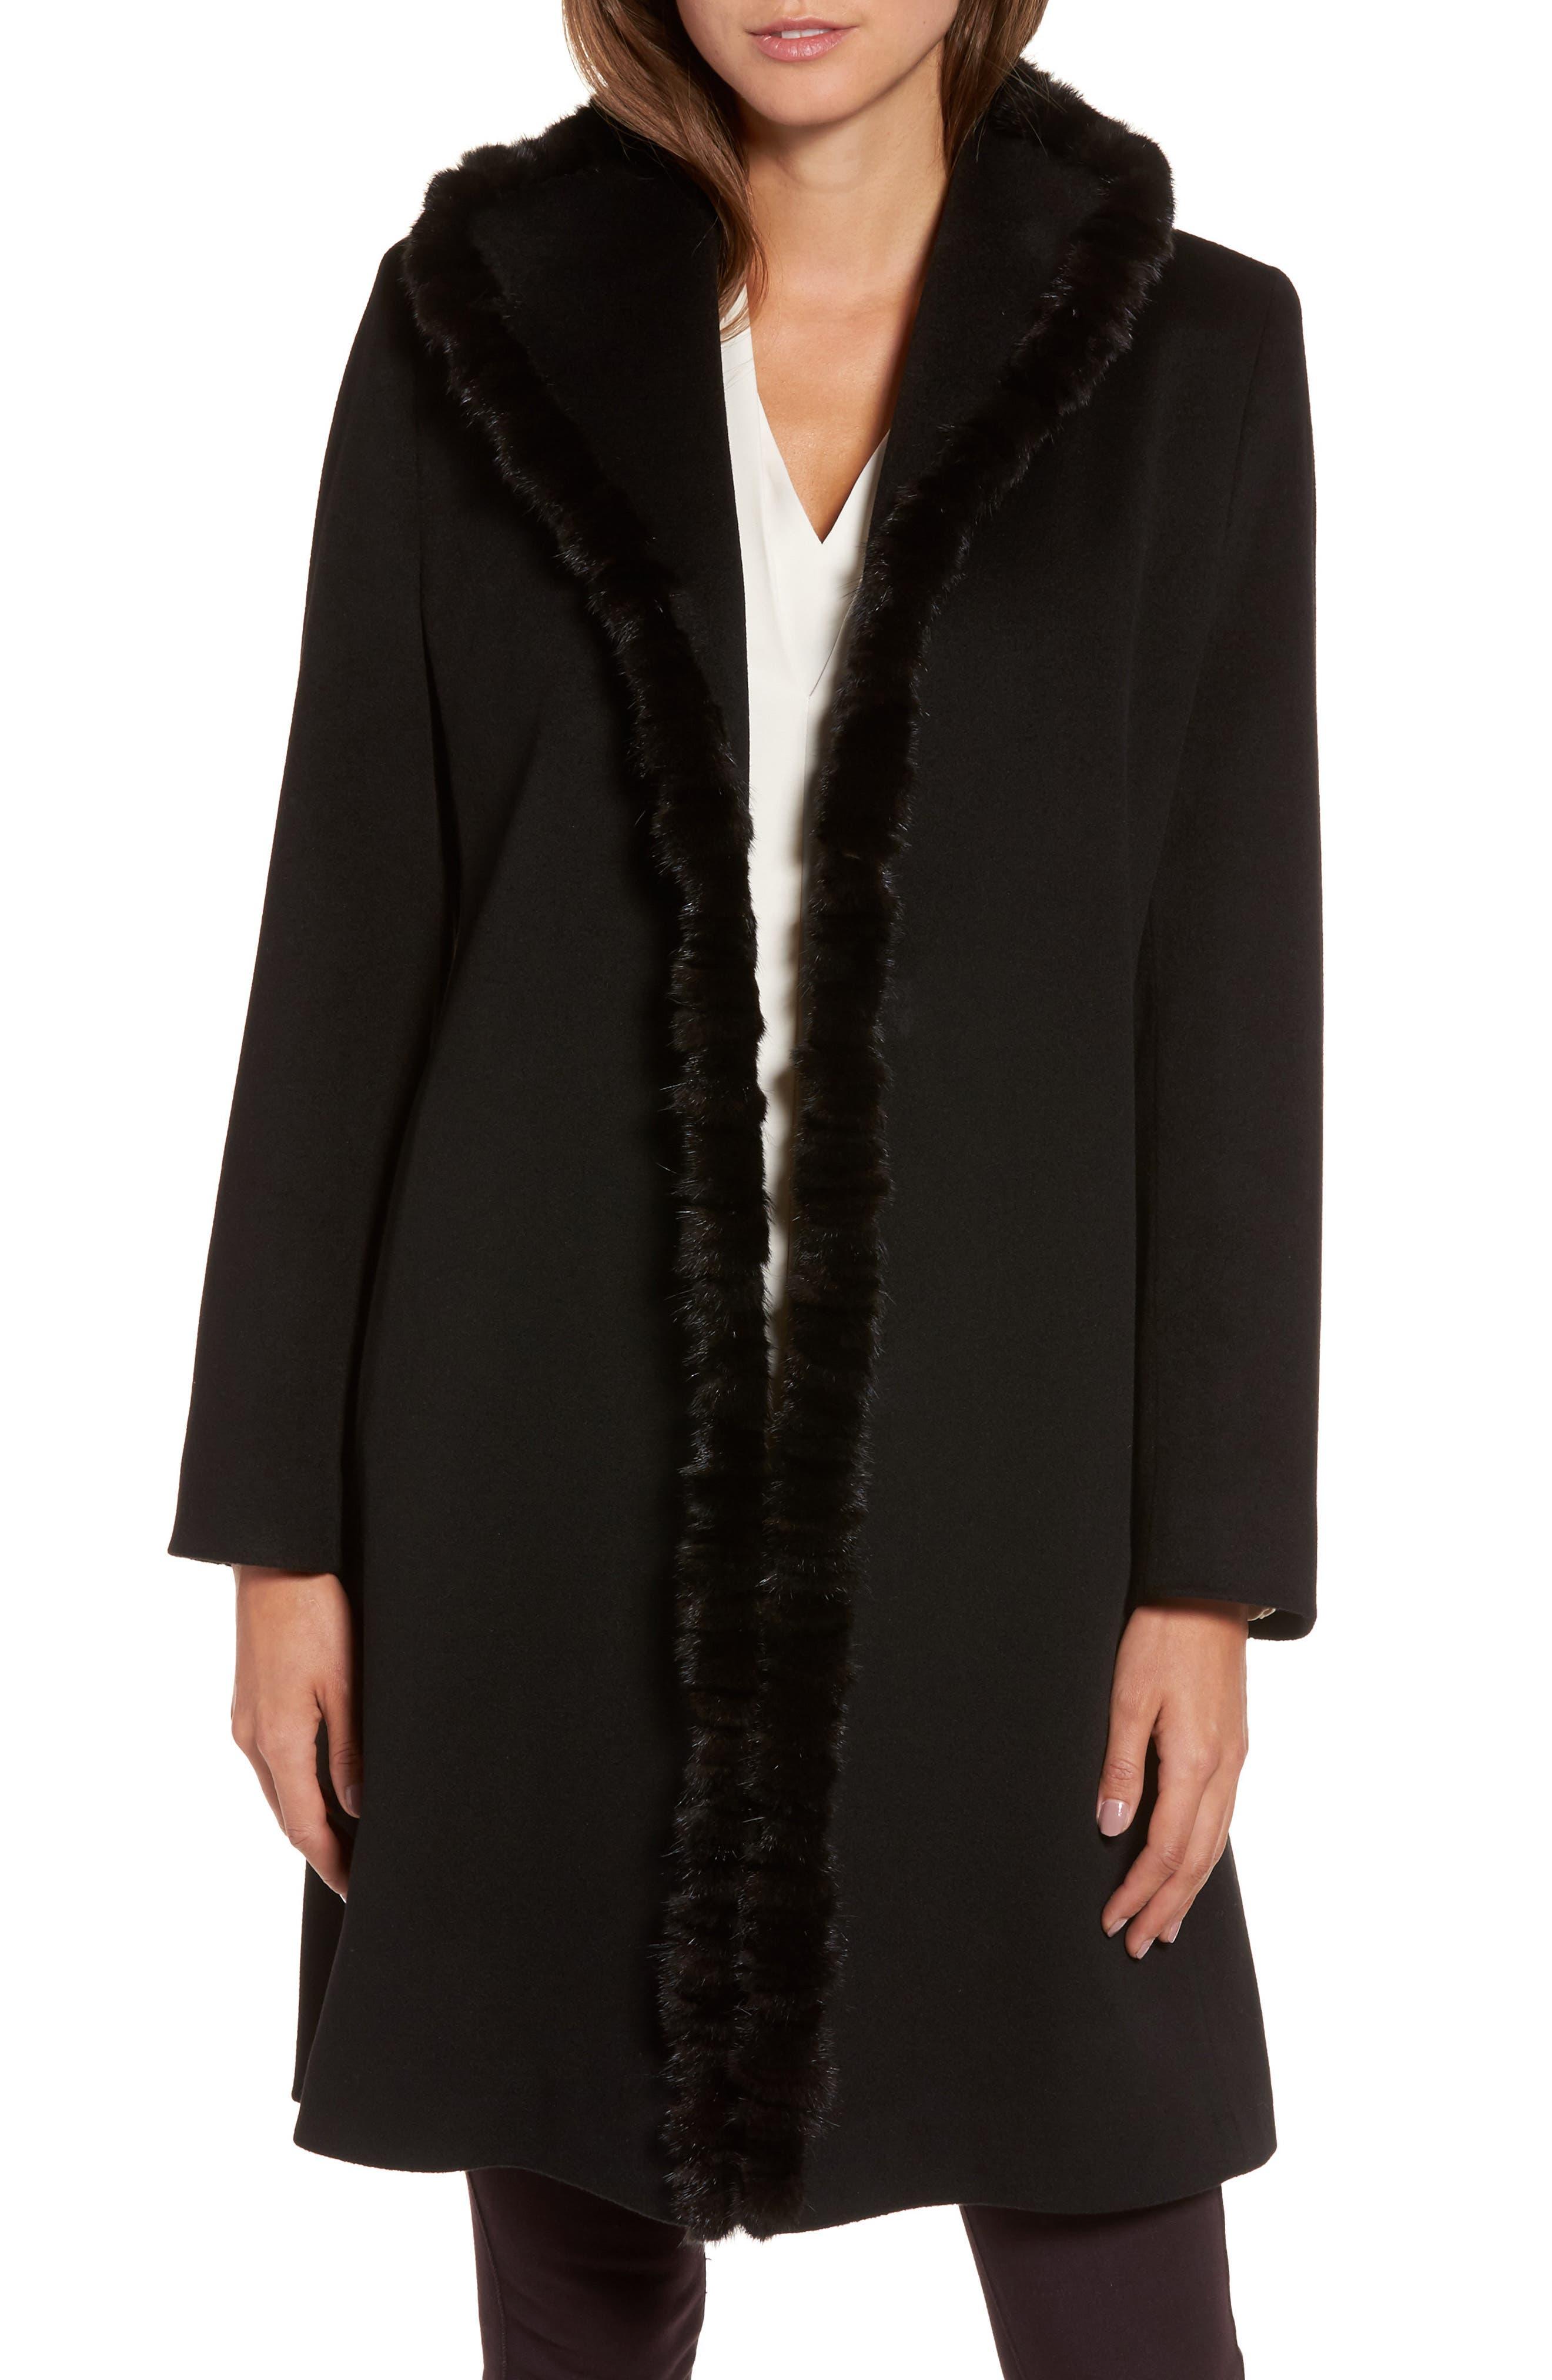 Loro Piana Wool Wing Collar Coat with Genuine Mink Trim,                             Main thumbnail 1, color,                             001